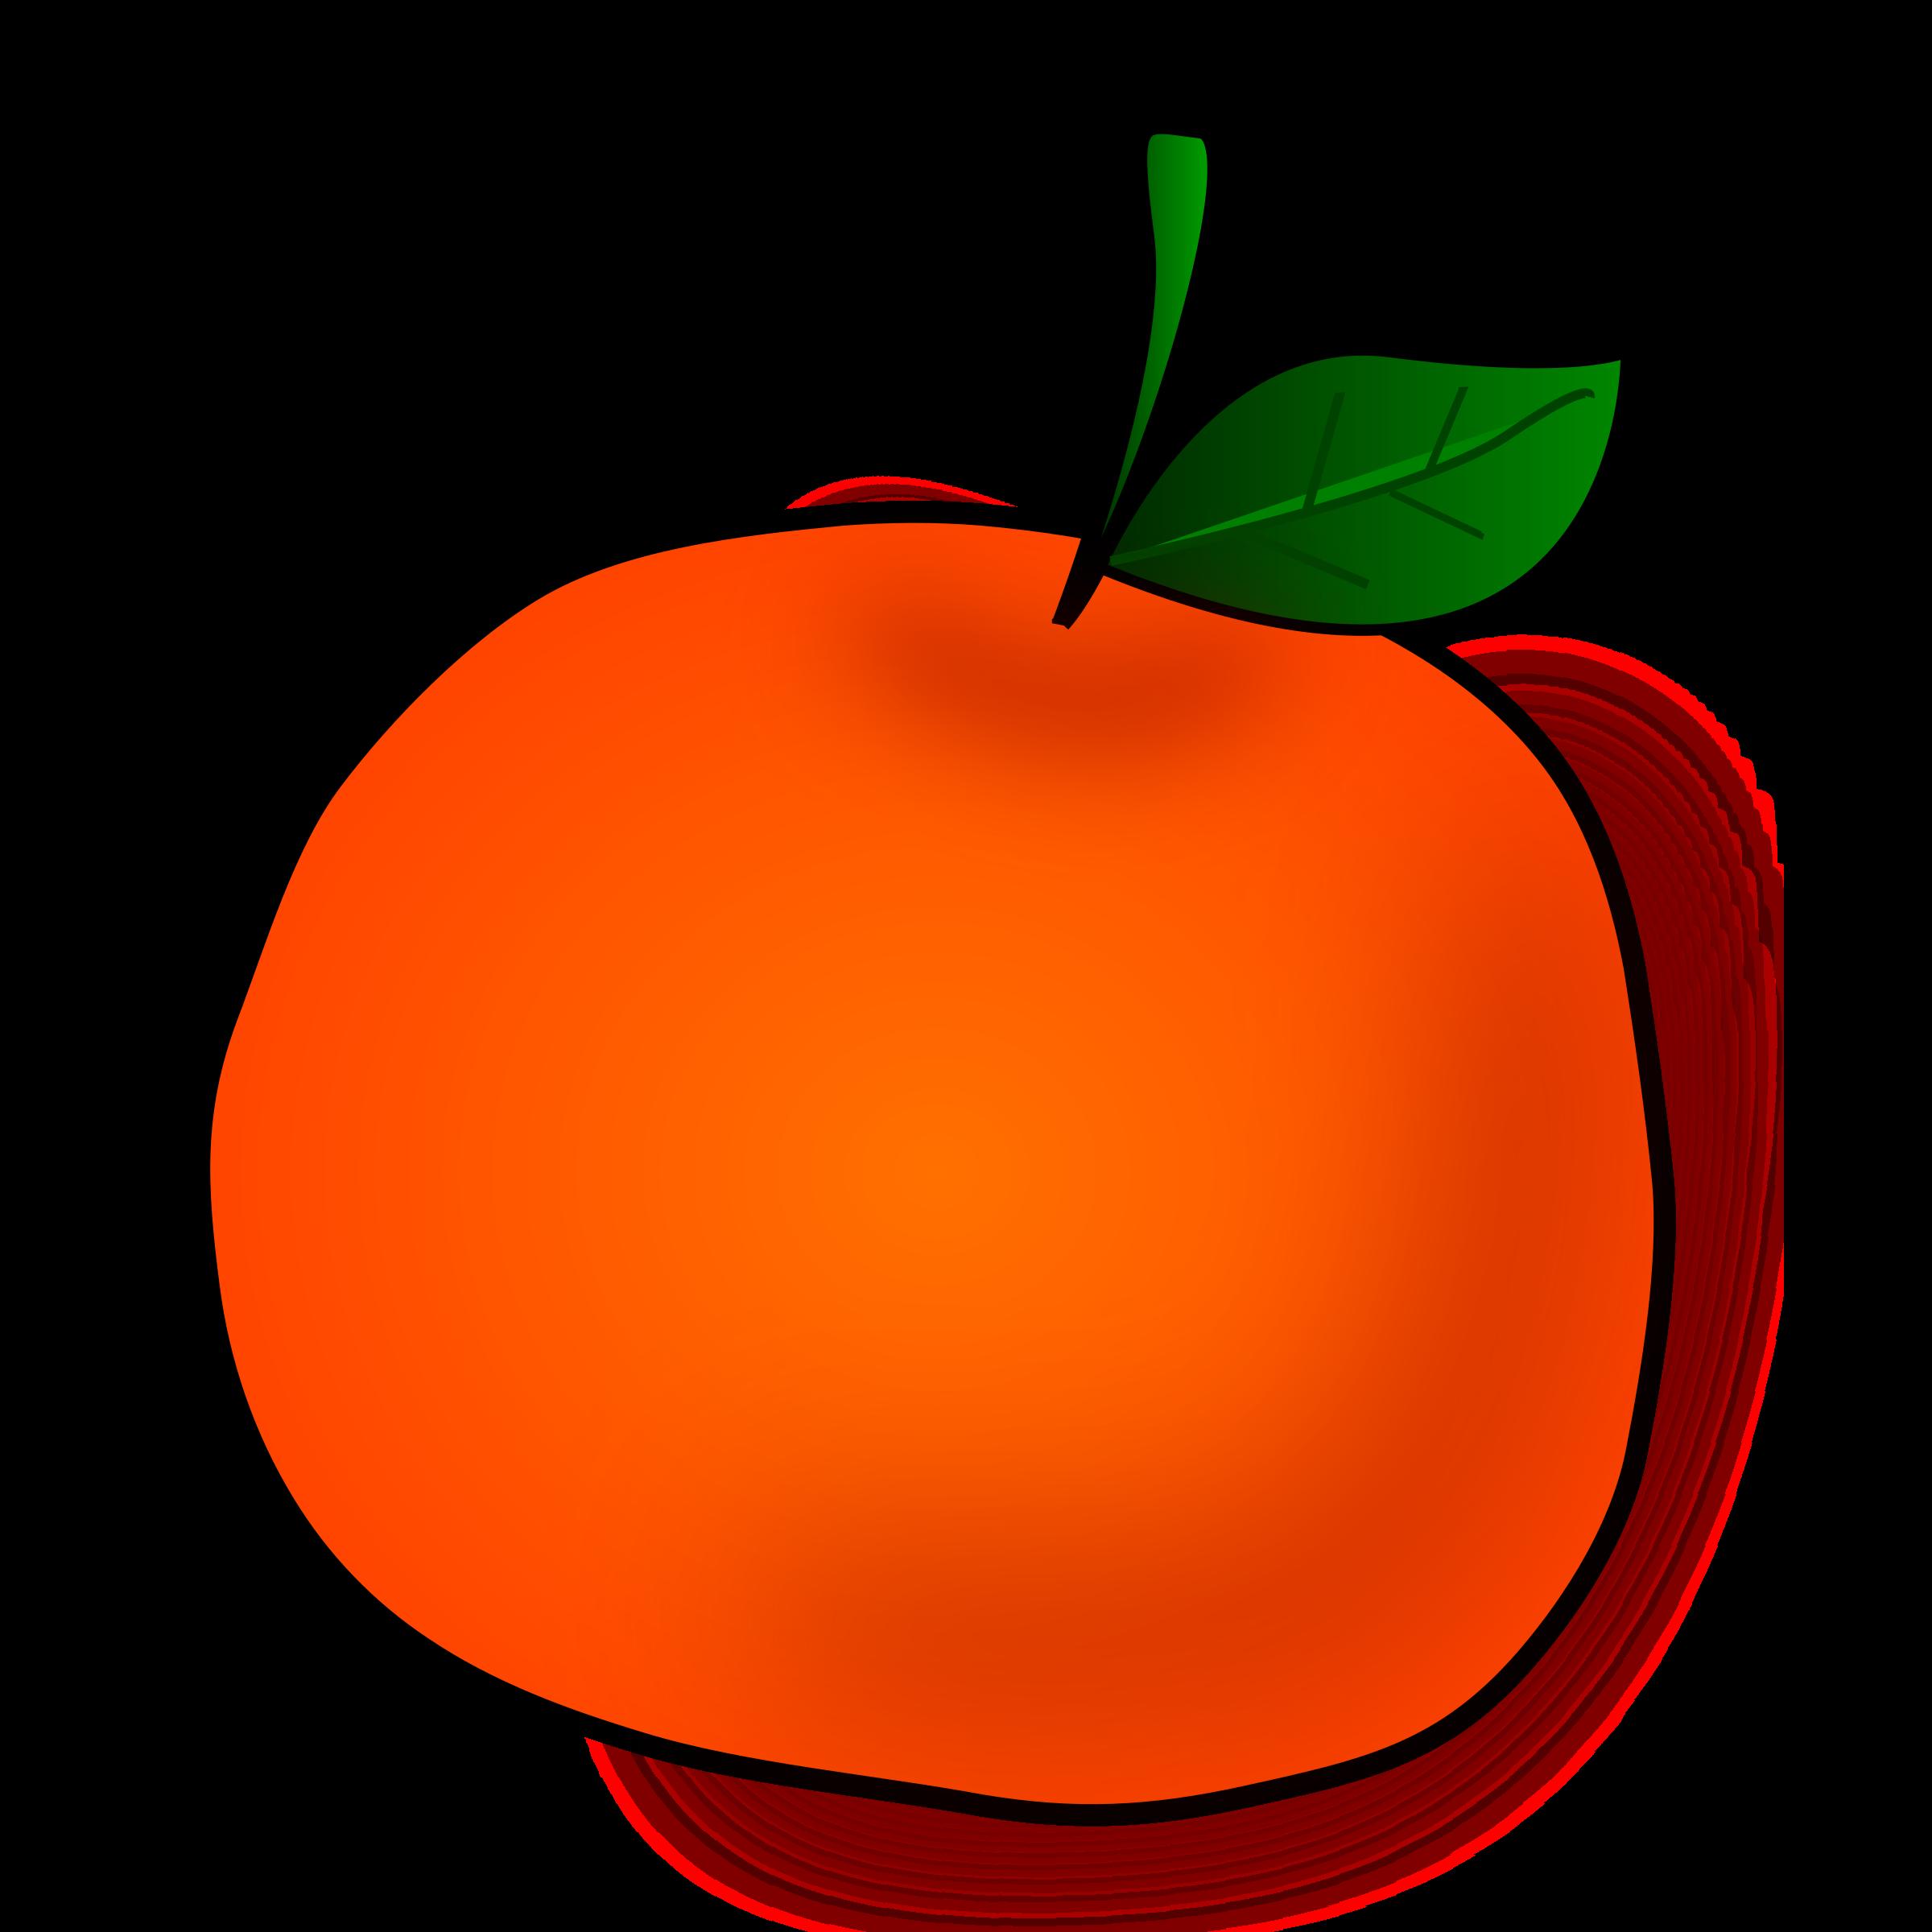 Picture clipart orange. Big image png